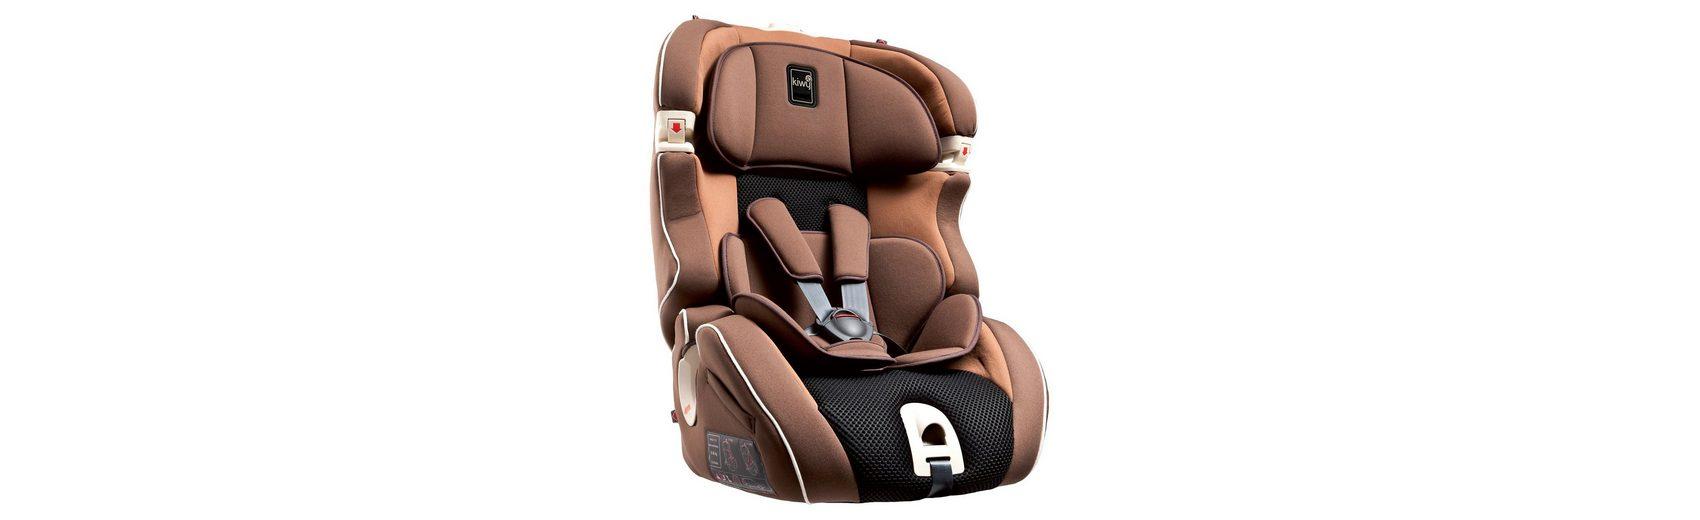 Kiwy Auto-Kindersitz SL123, Moka, 2016